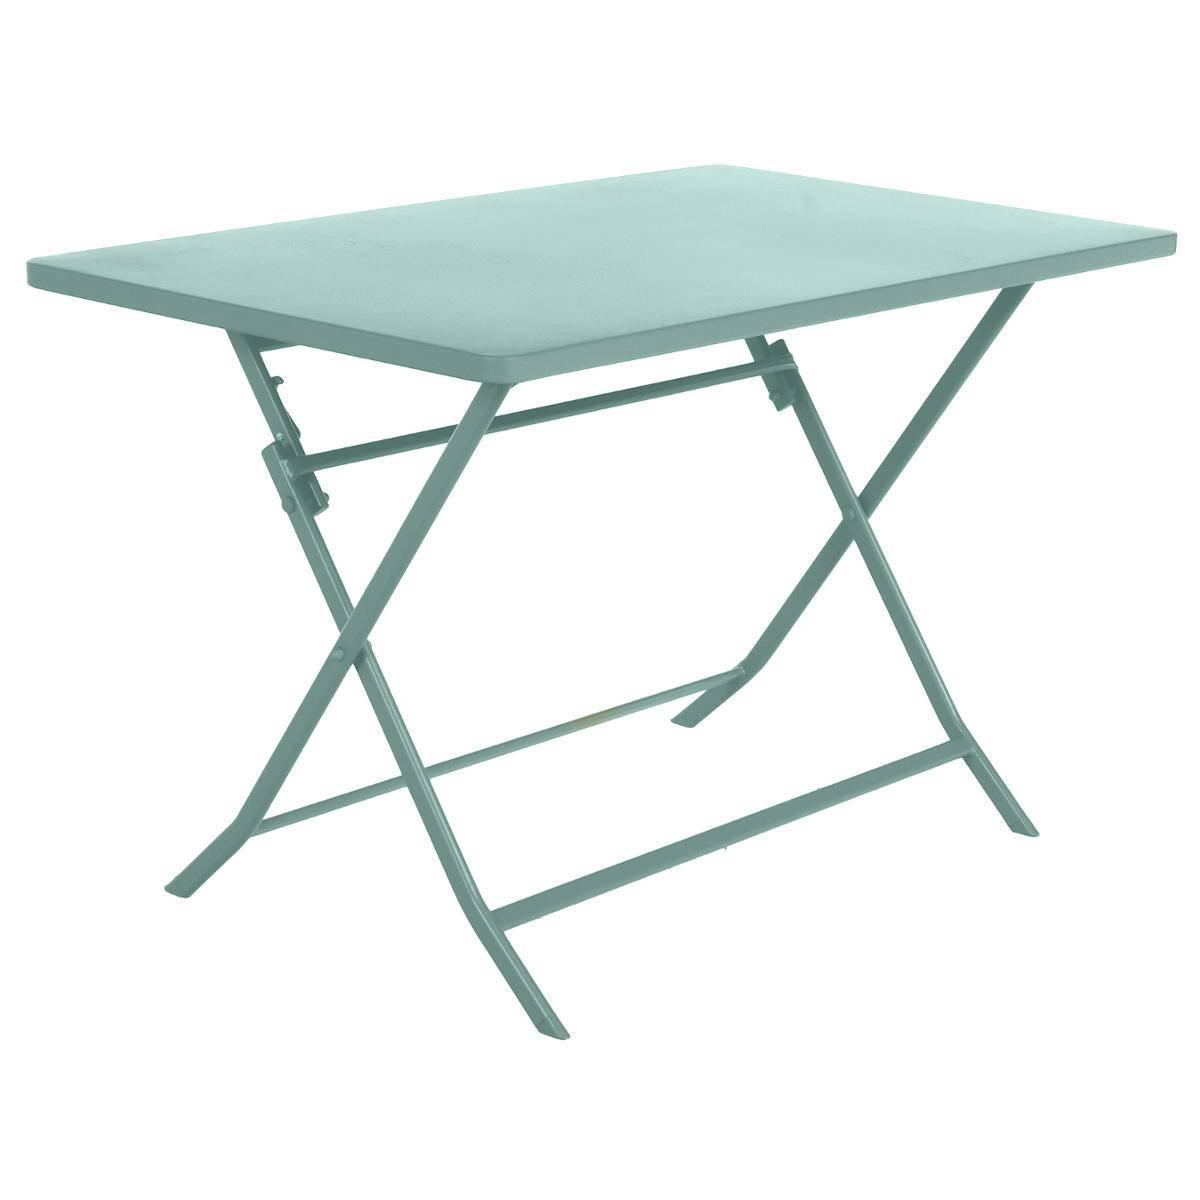 table de jardin pliante rectangulaire greensboro vert celadon hesperide com